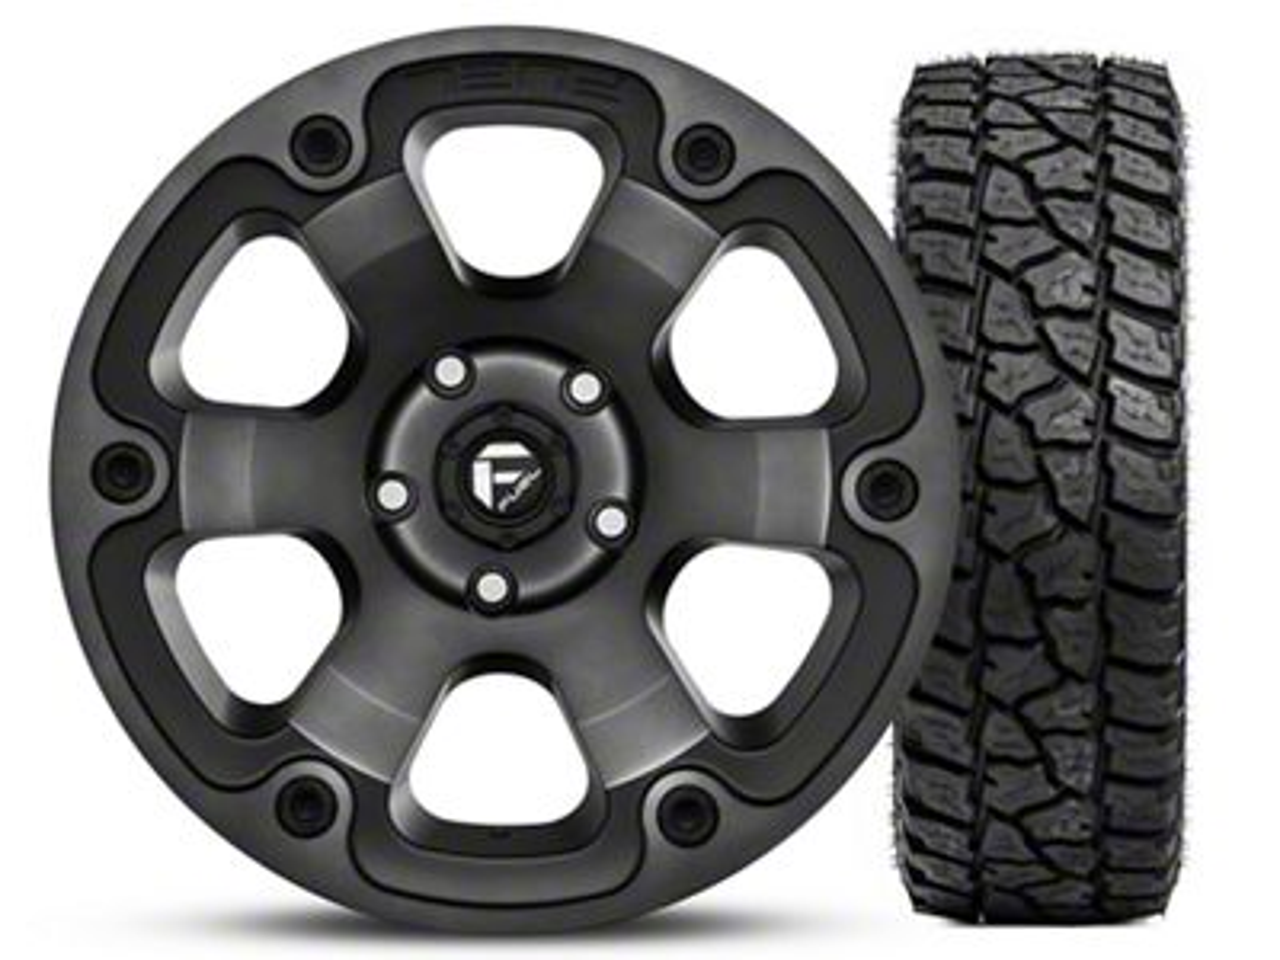 Fuel Wheels Beast Black Machined Wheel 17x9 and Mickey Thompson Baja ATZP3 LT265/70R17 Kit (07-18 Jeep Wrangler JK)